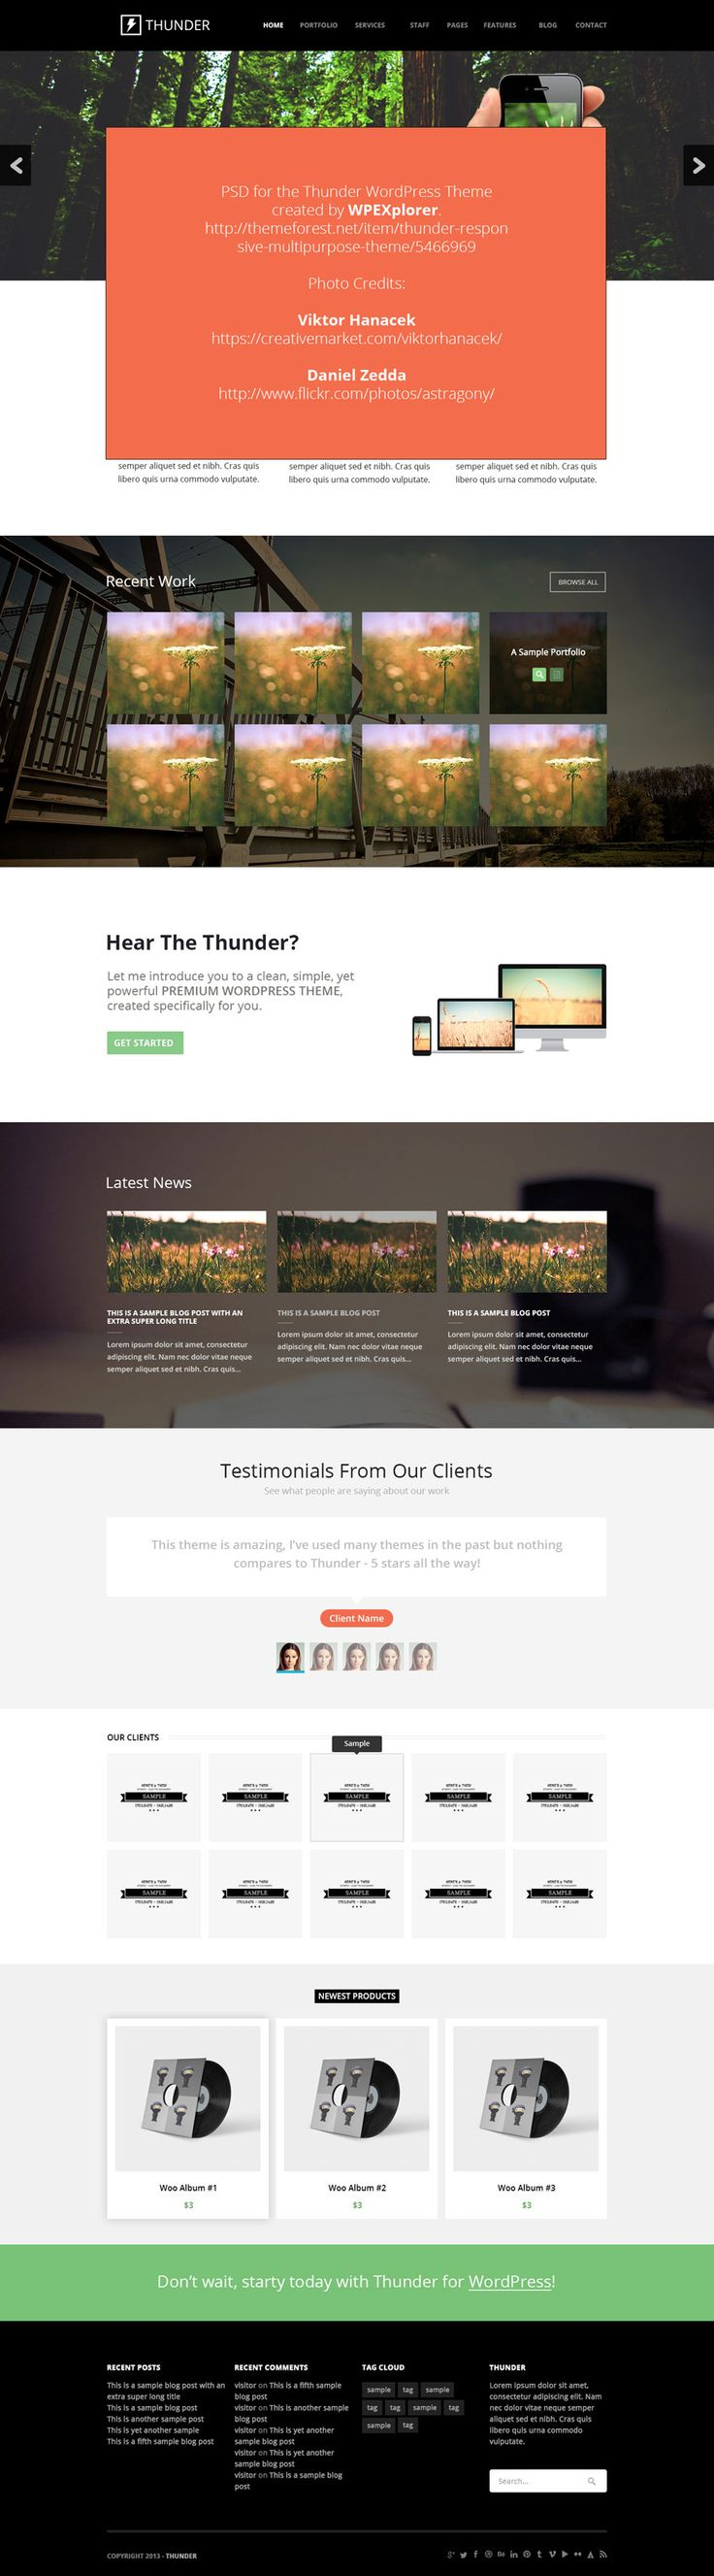 Thunder – Free Web Template